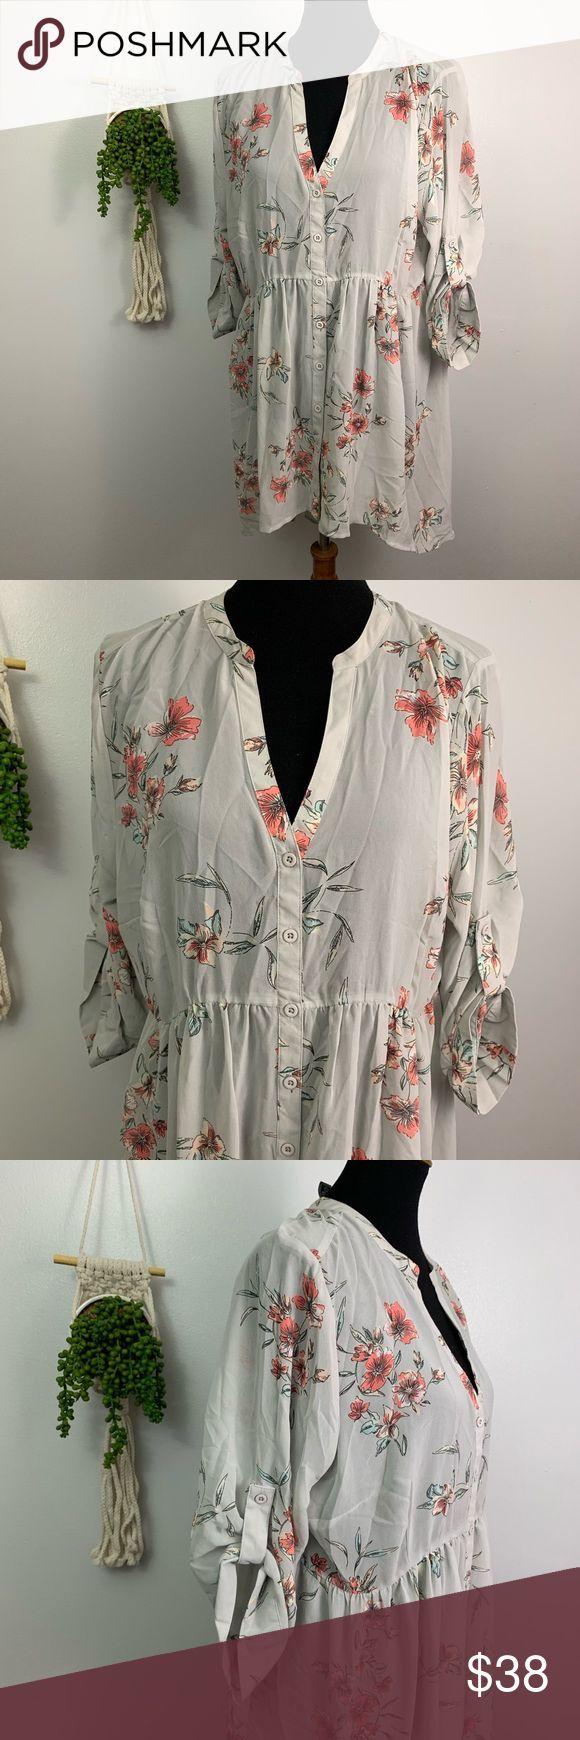 Torrid   Grey Chiffon Floral High Low Tunic Top  1 Item: Long high/low hem tunic